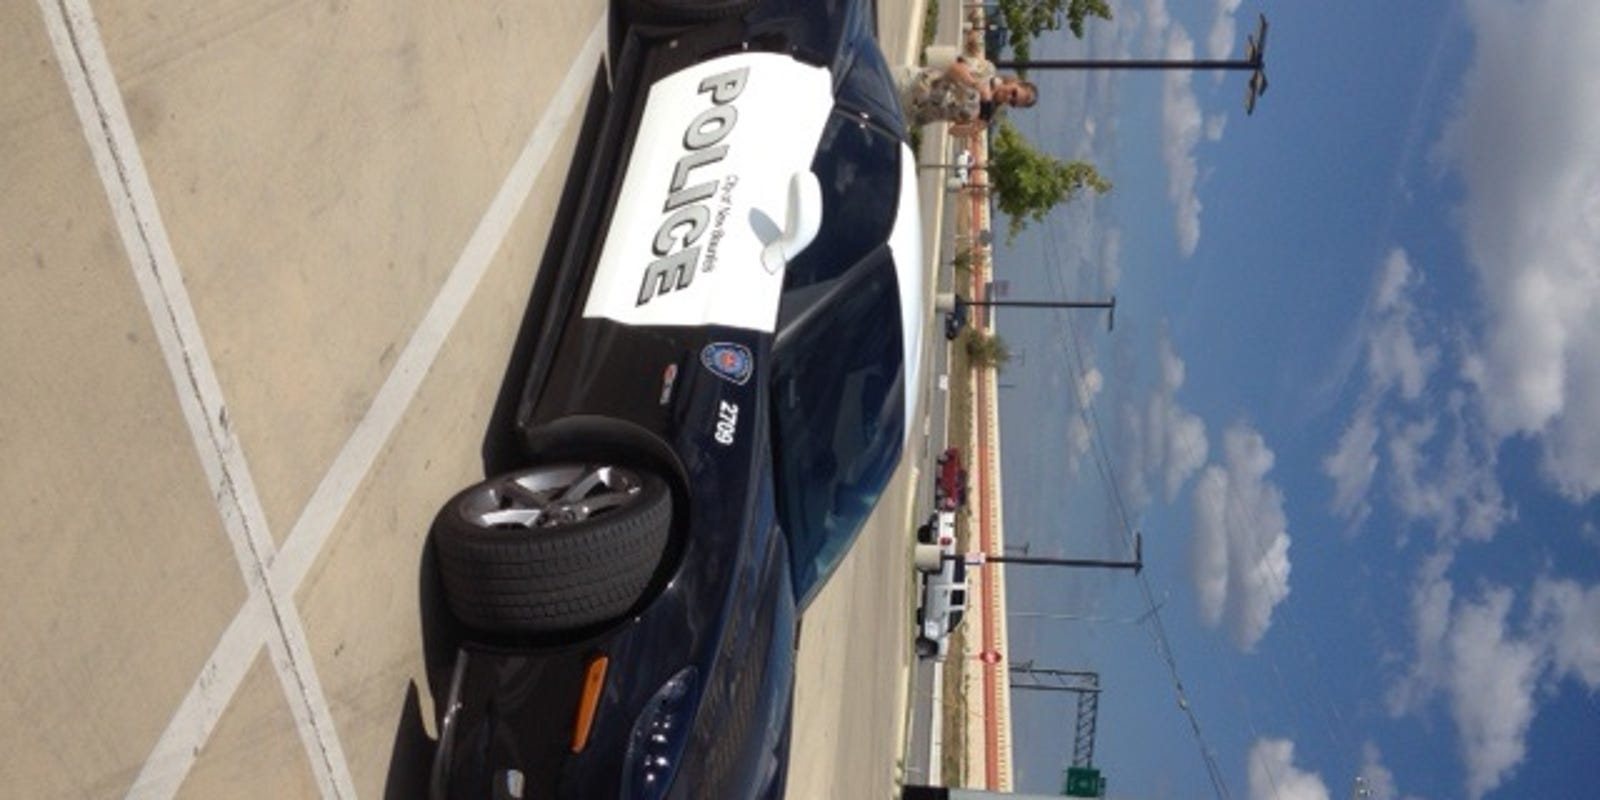 New Braunfels Police Department adds Corvette to fleet